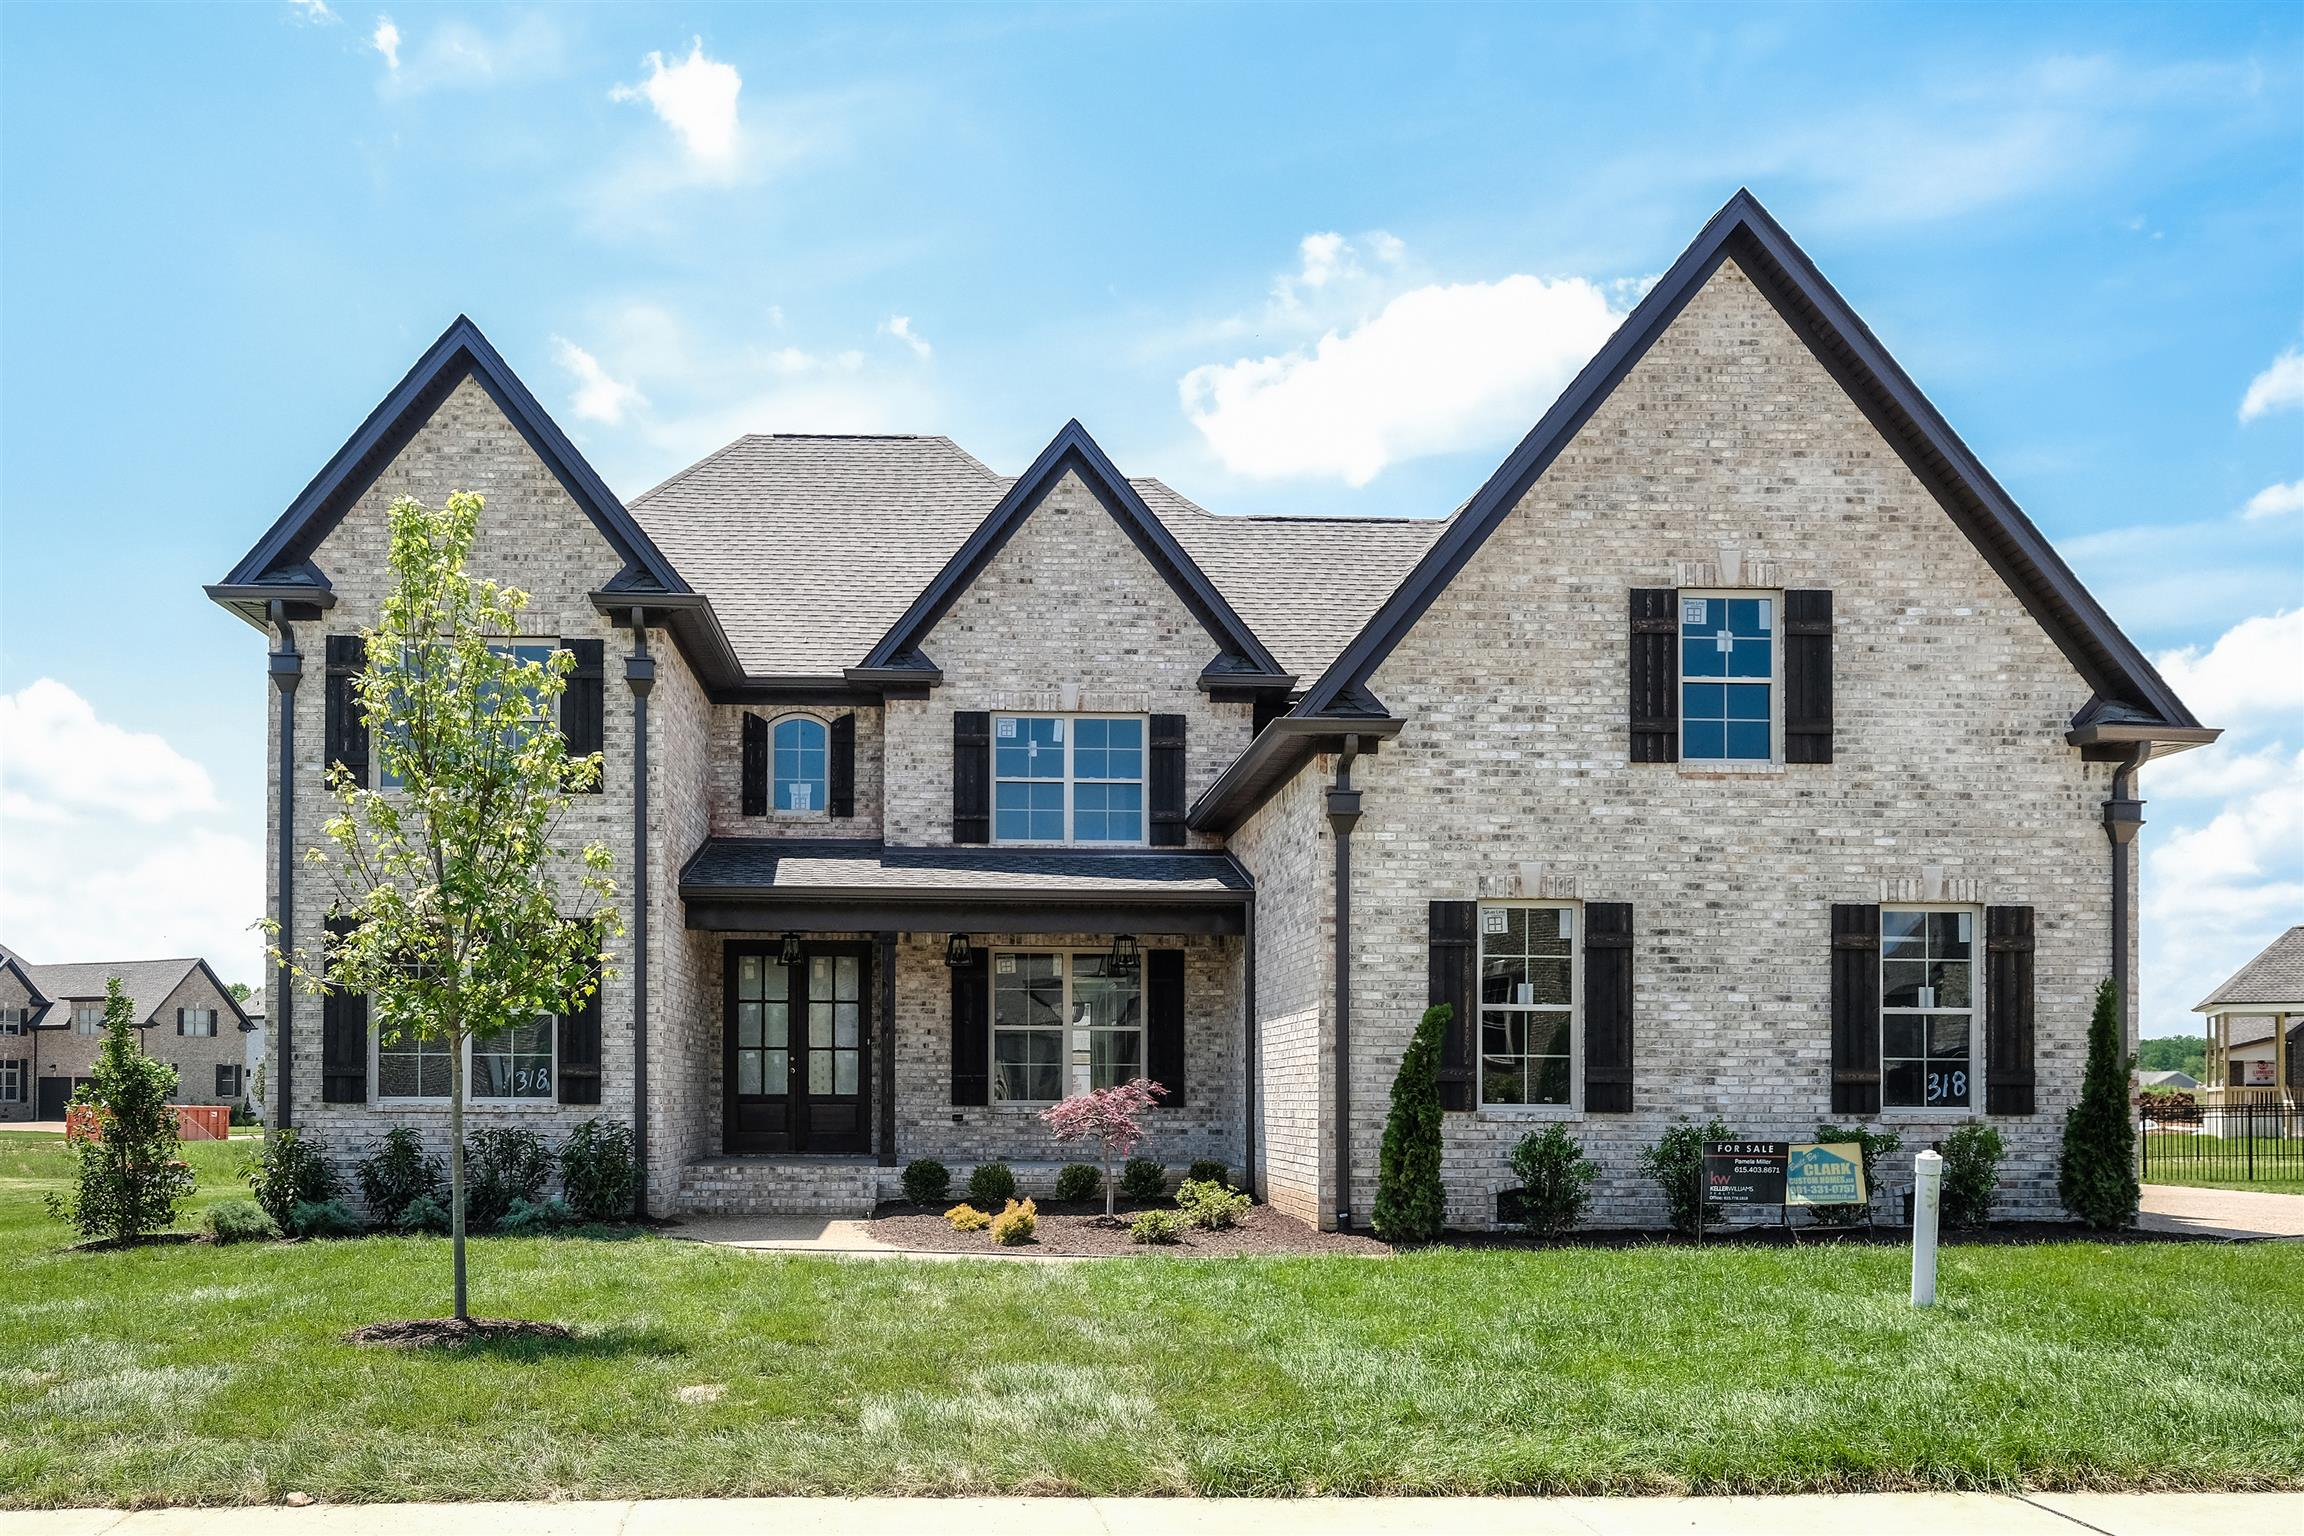 4014 Cardigan Ln (Lot 318), Spring Hill, Tennessee